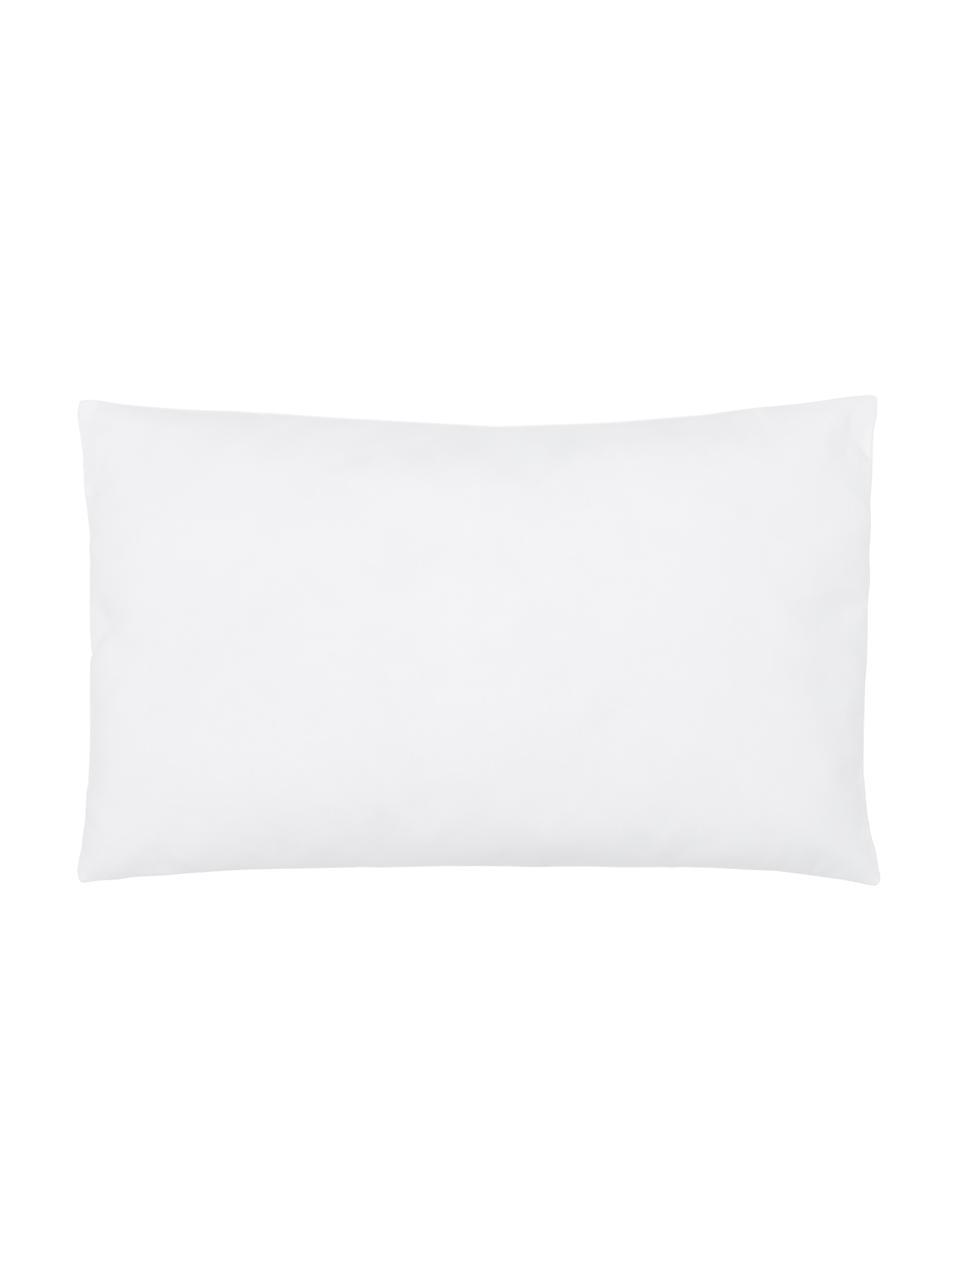 Microfiber kussenvulling Sia, 30 x 50 cm, Wit, 30 x 50 cm